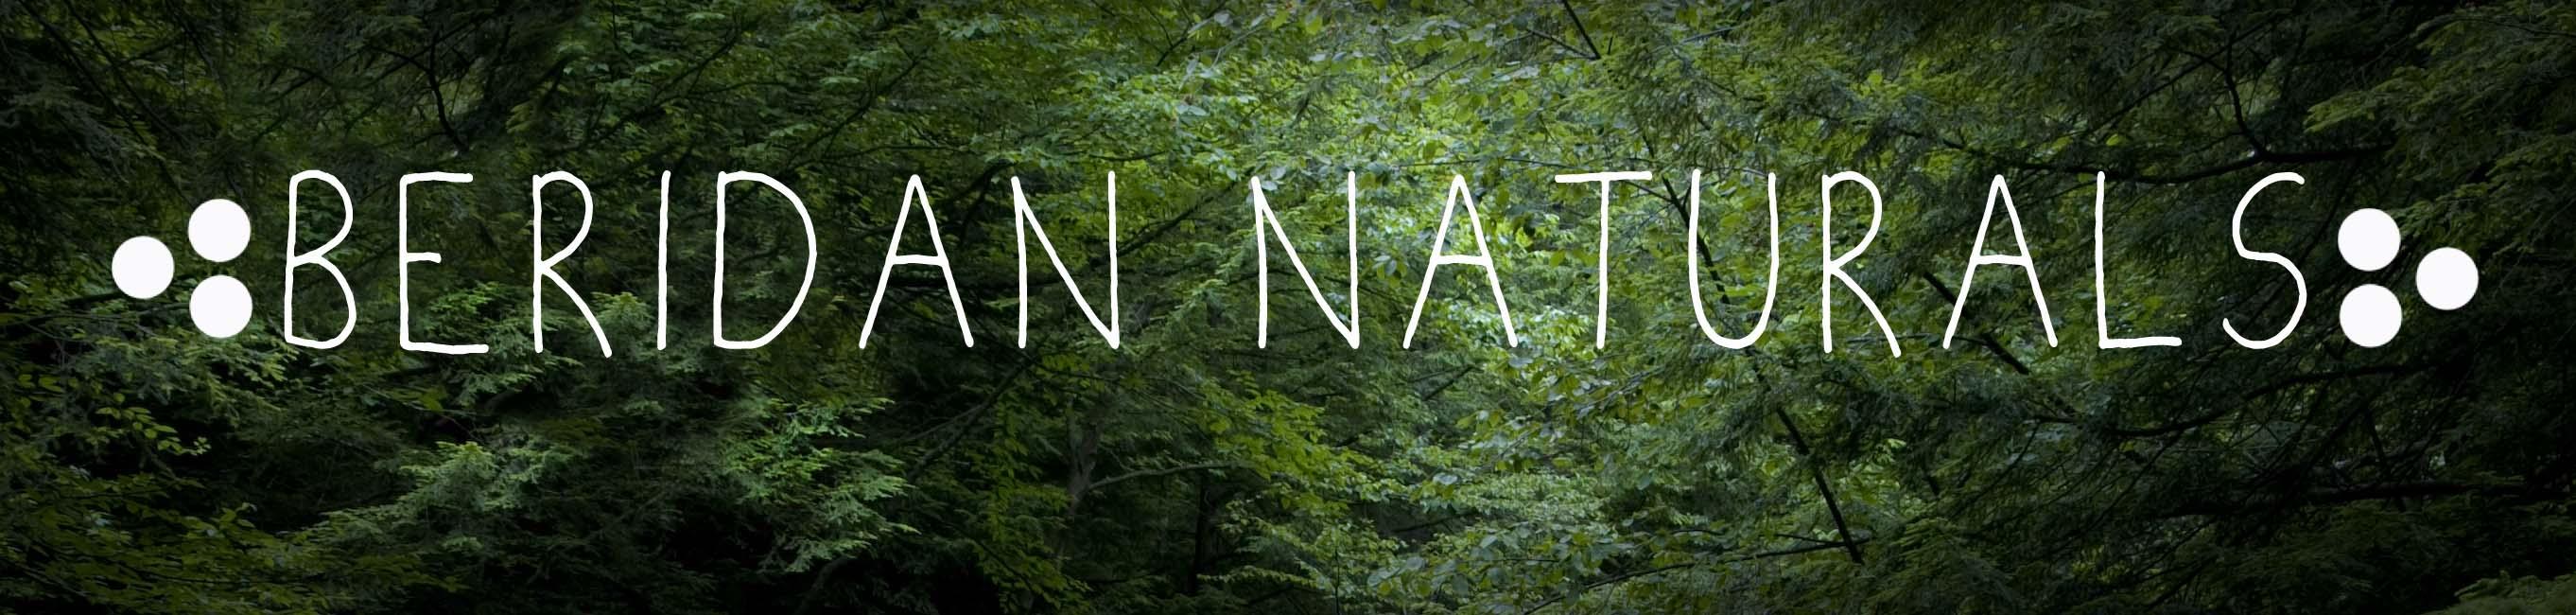 Beridan Naturals